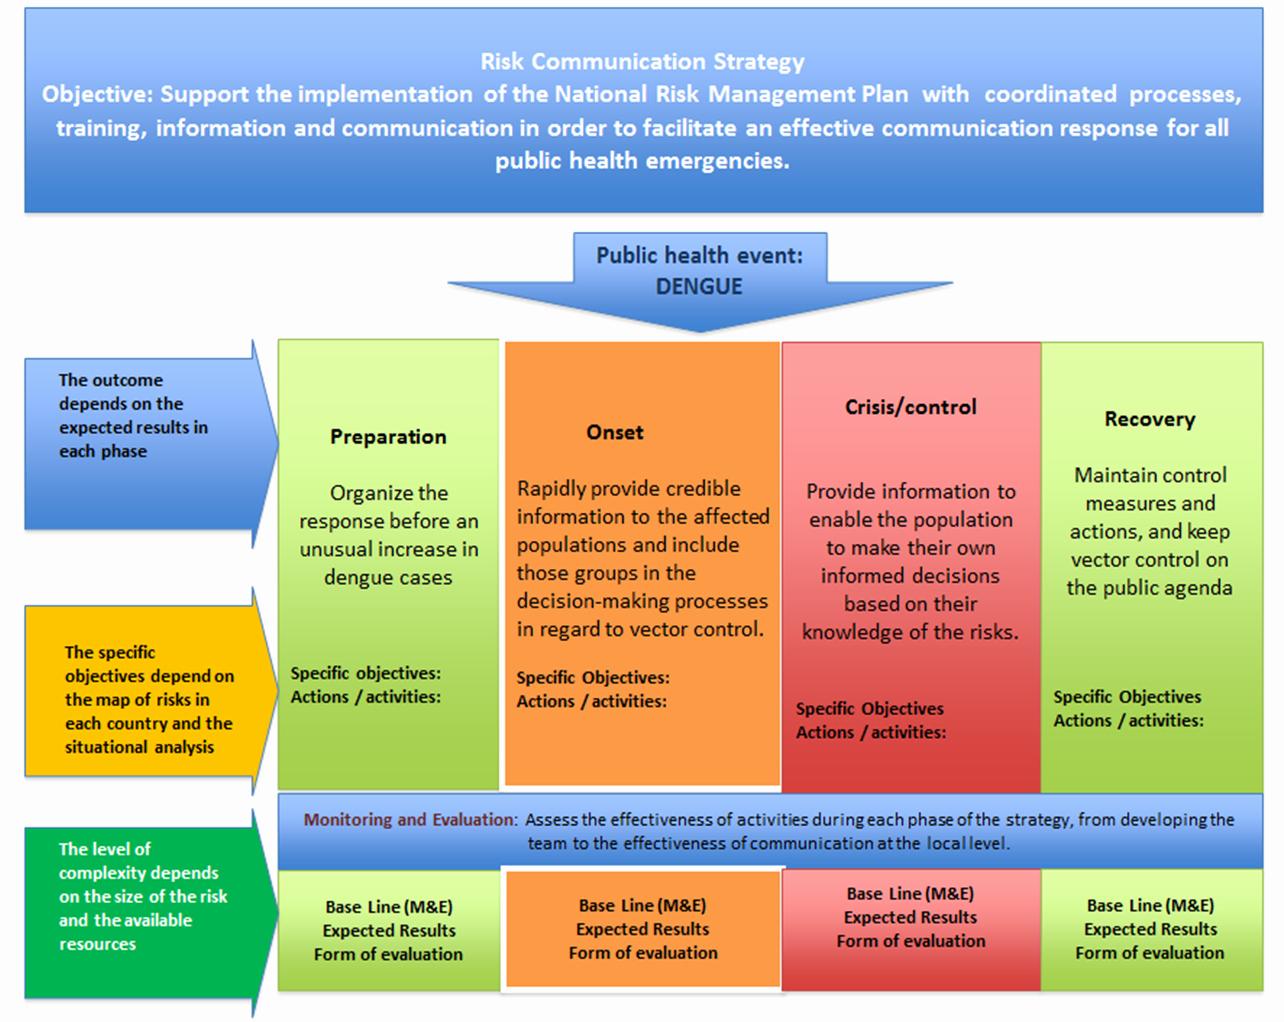 Strategic Communication Plan Template Elegant Marketing Plan Template Google Search